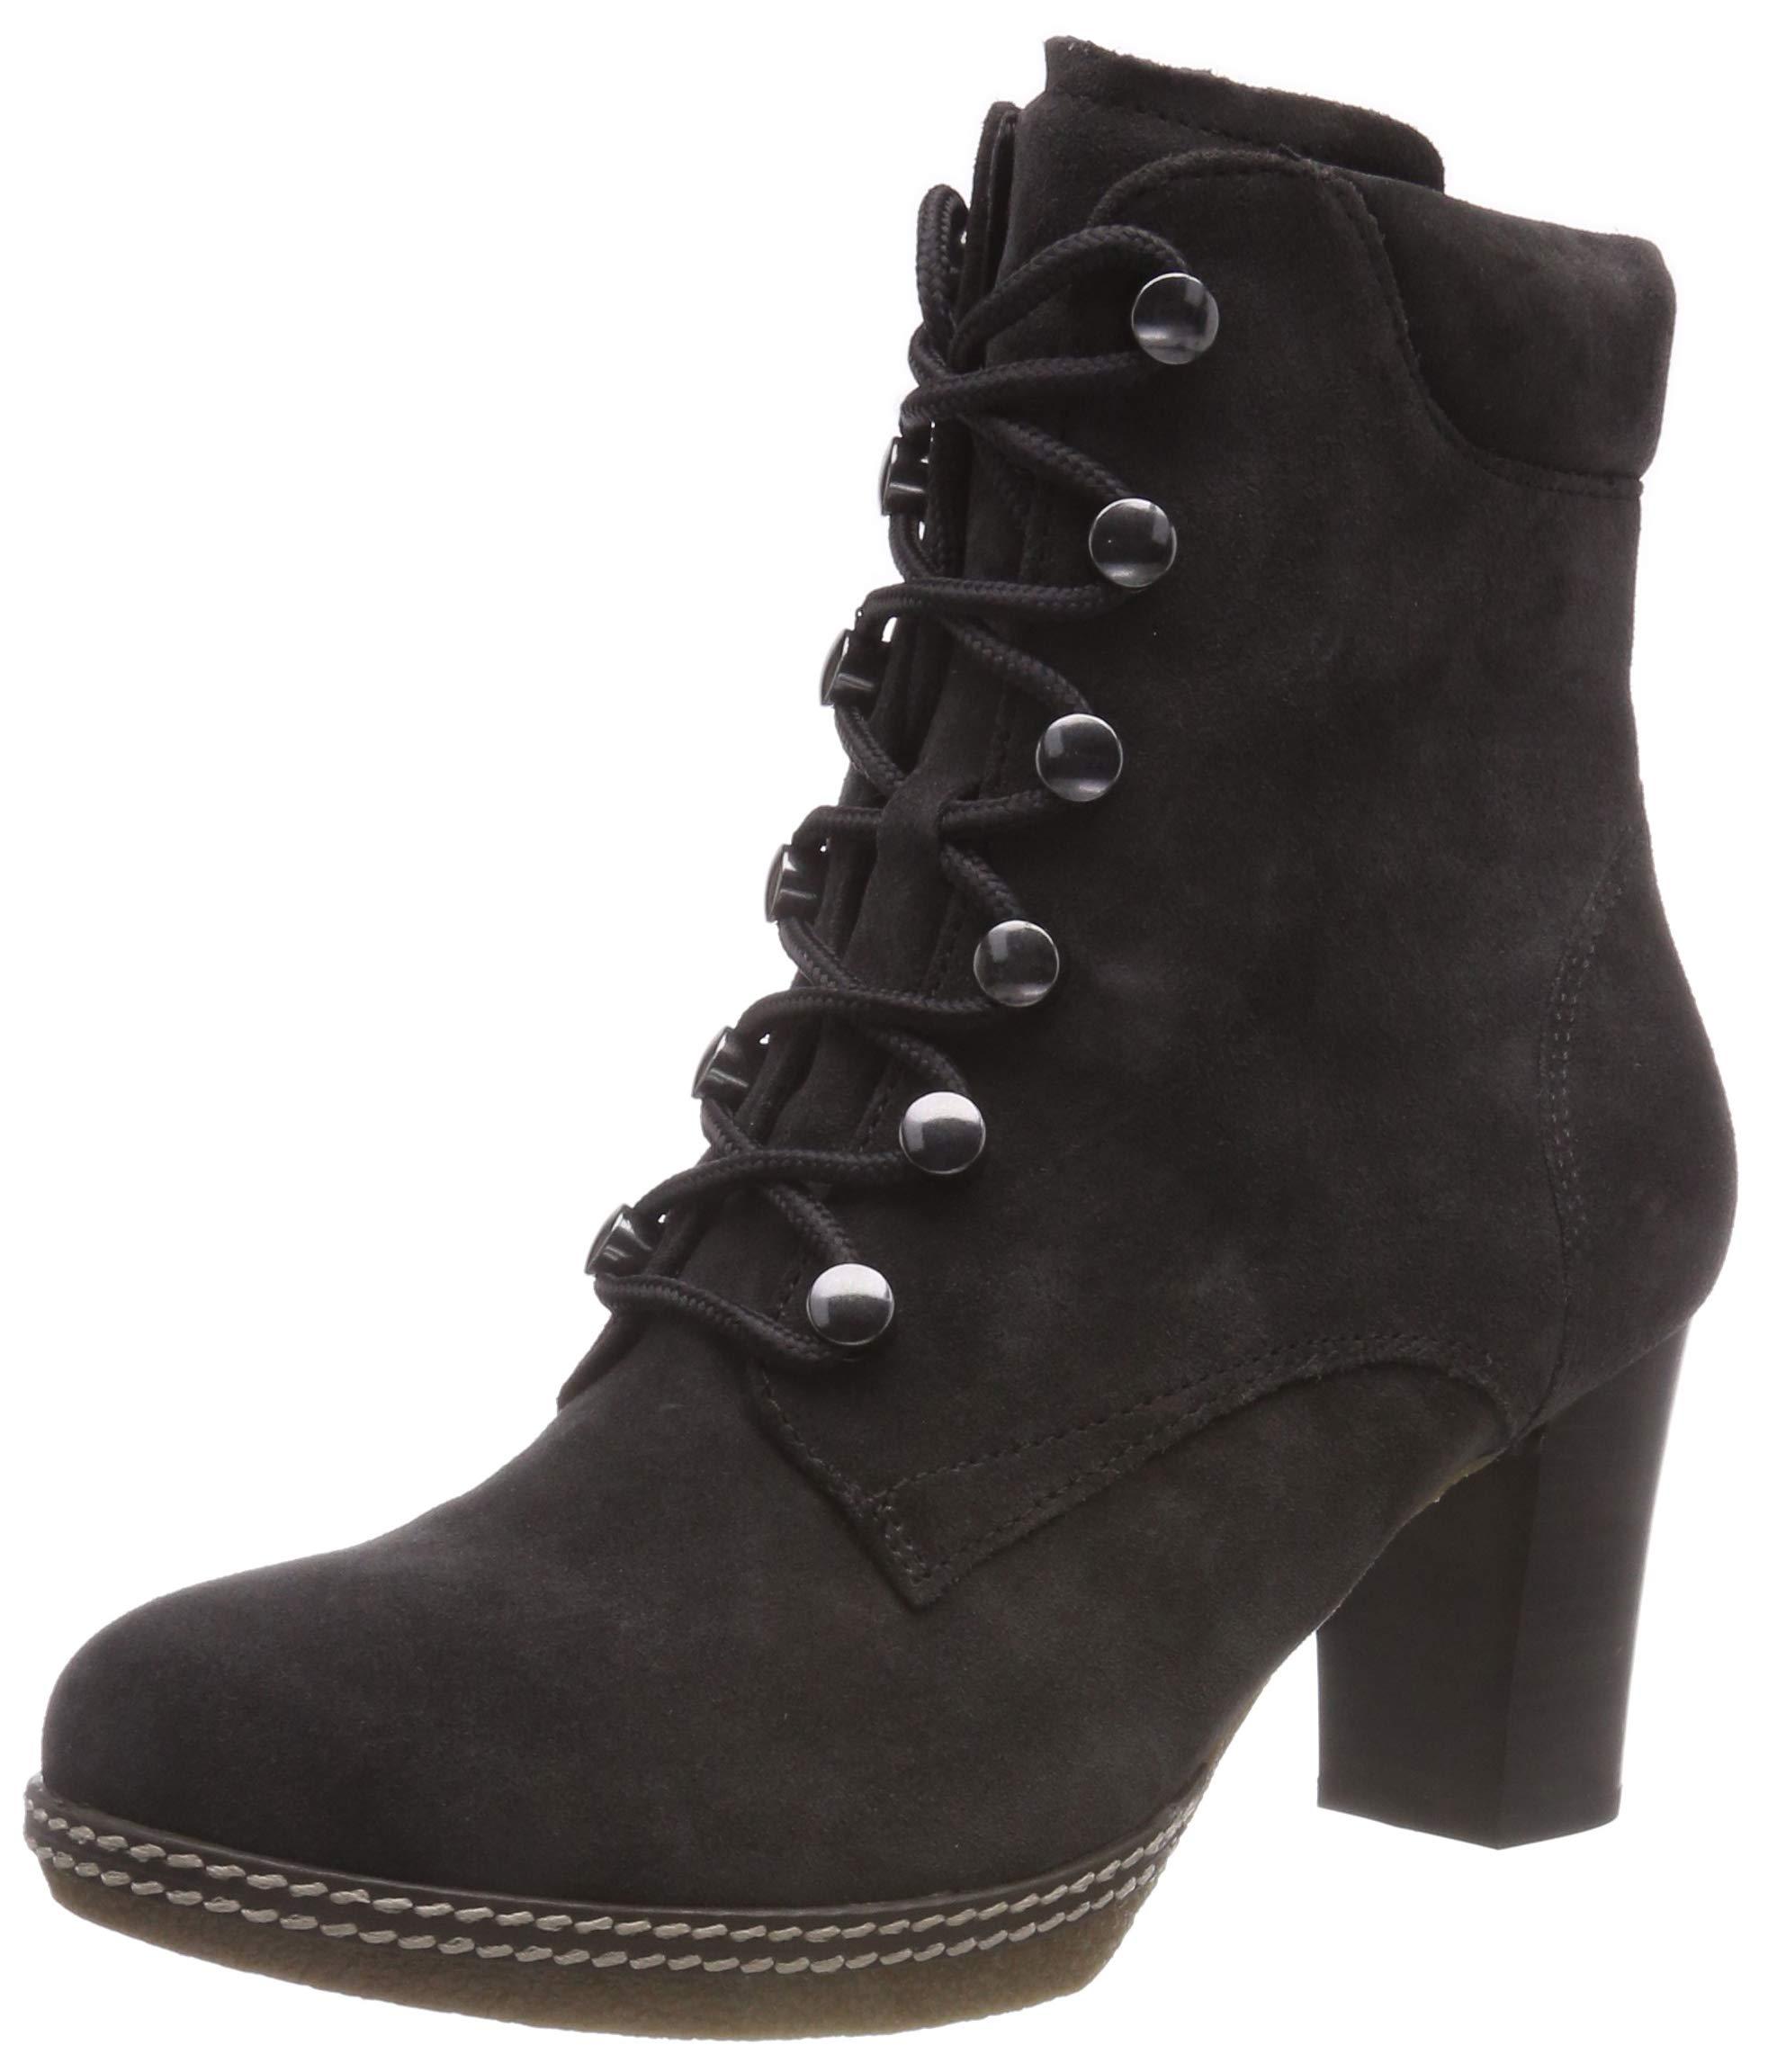 Gabor Comfort Shoes 5 FemmeGrisdark greymicro3937 SportBotines Eu Qthsrd